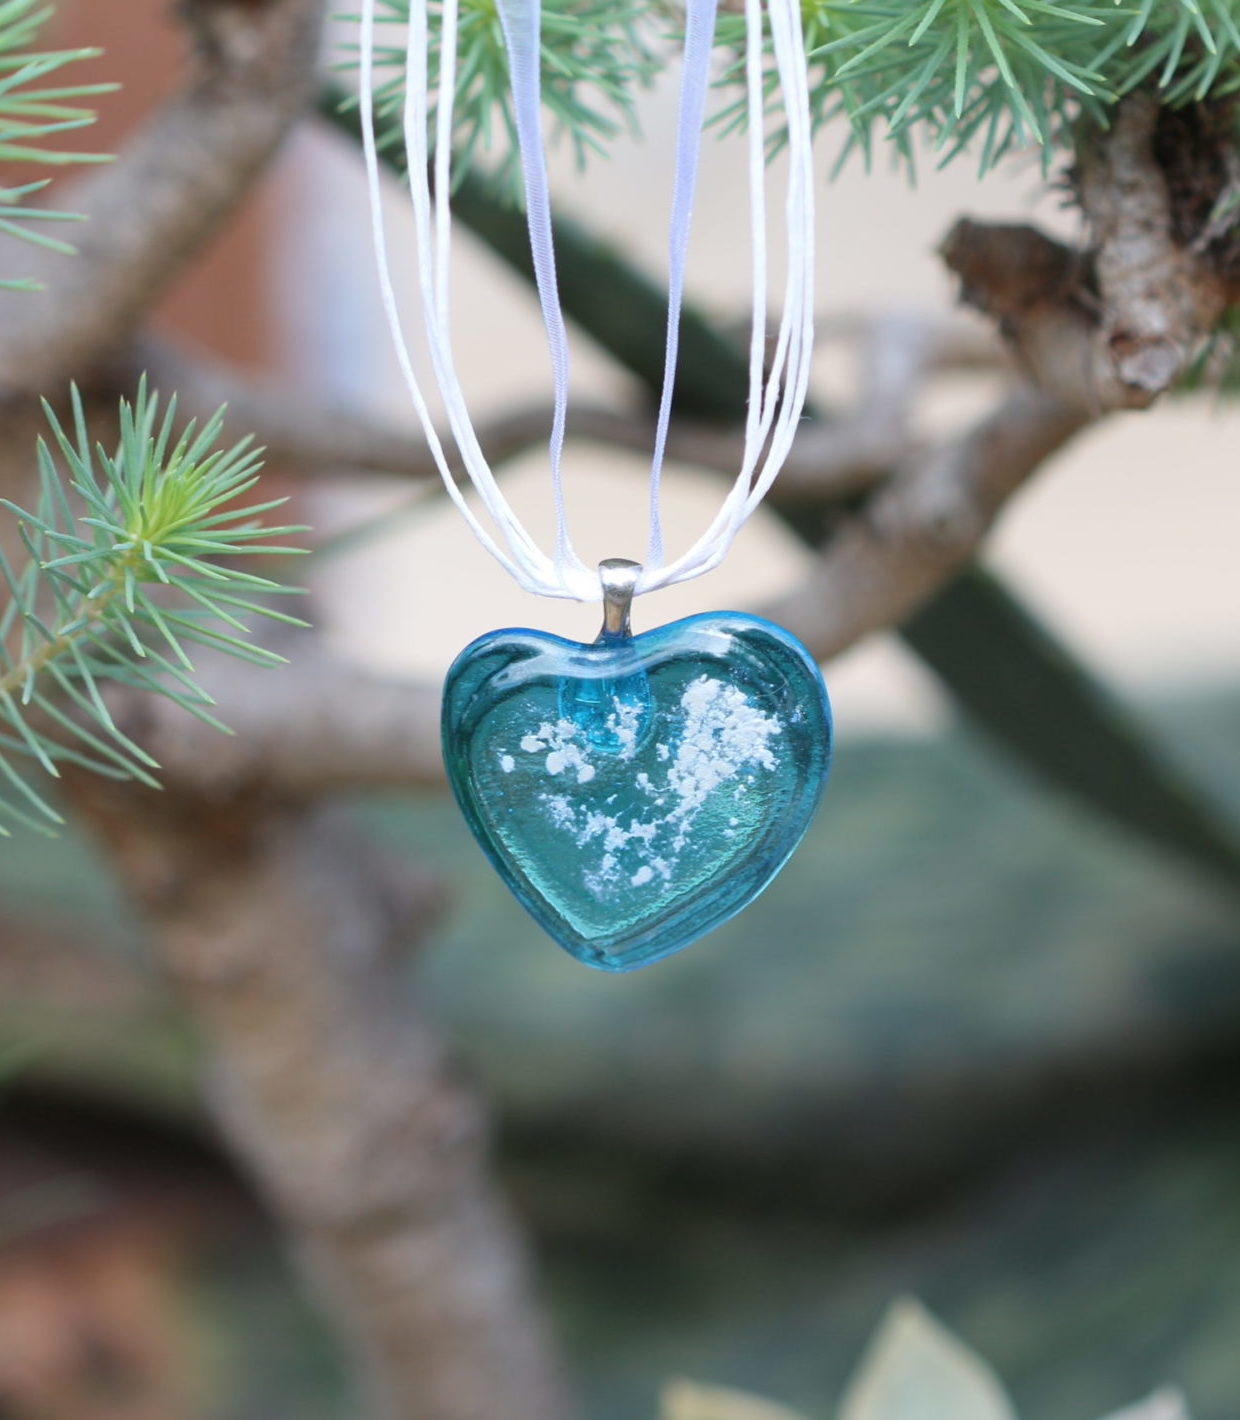 Pendentif cœur en verre transparent bleu